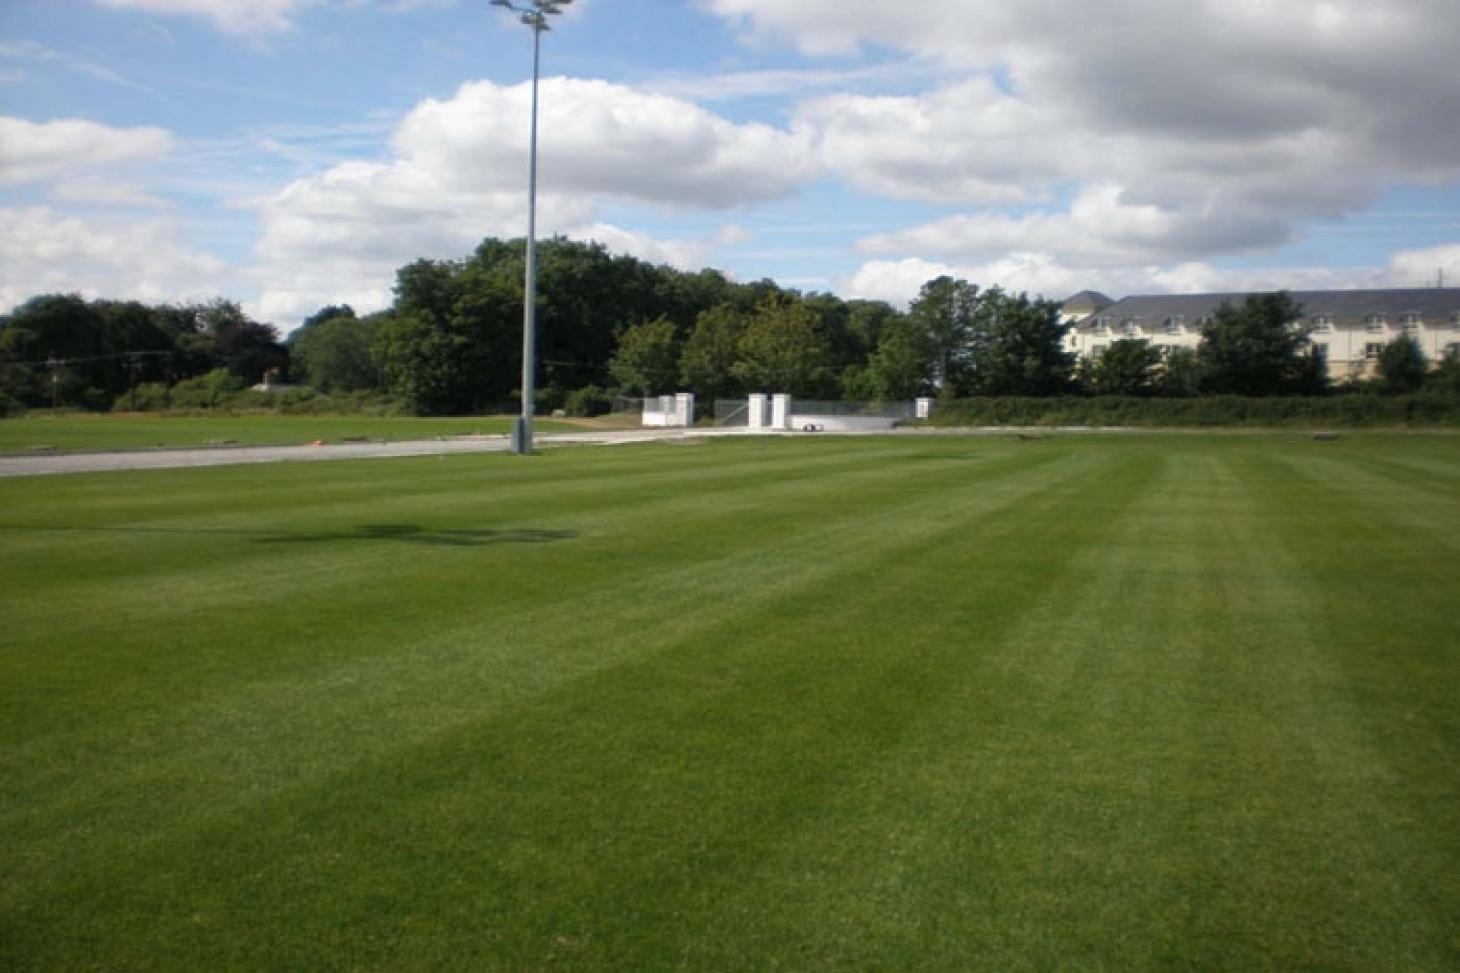 Castleknock GAA Club Full size   Grass gaa pitch